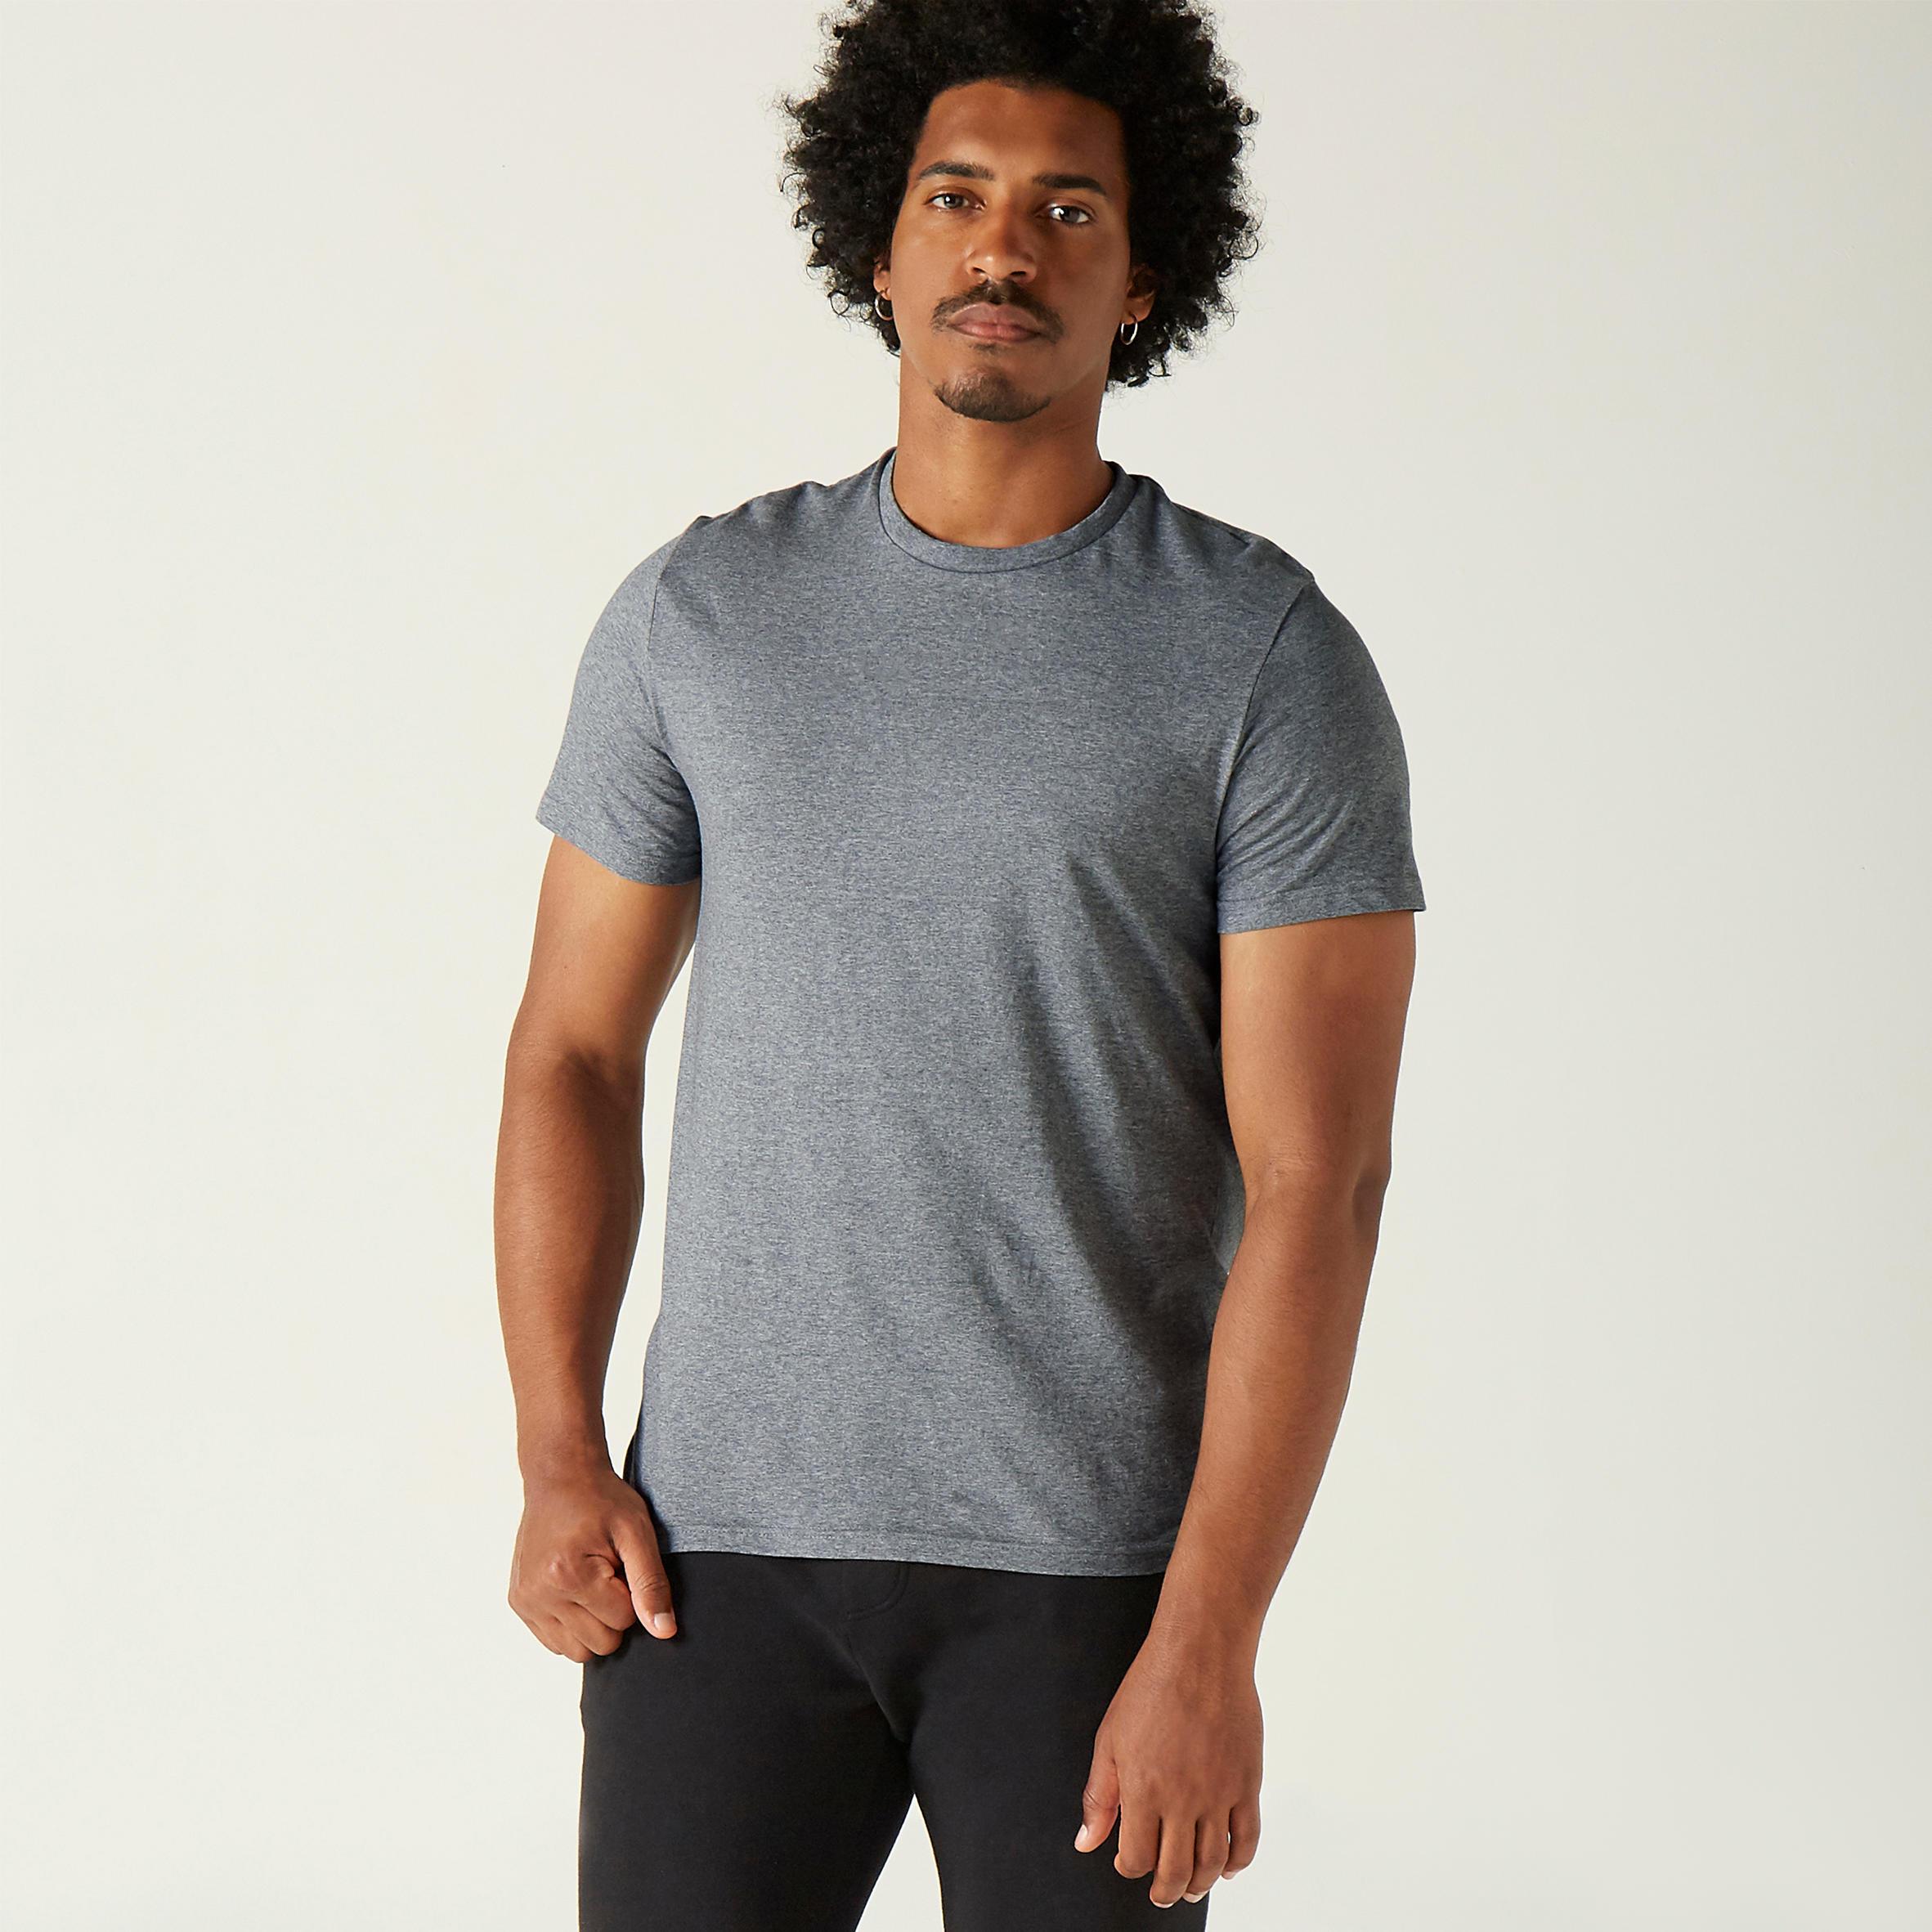 Tricou Regular 100 Gri Bărbați